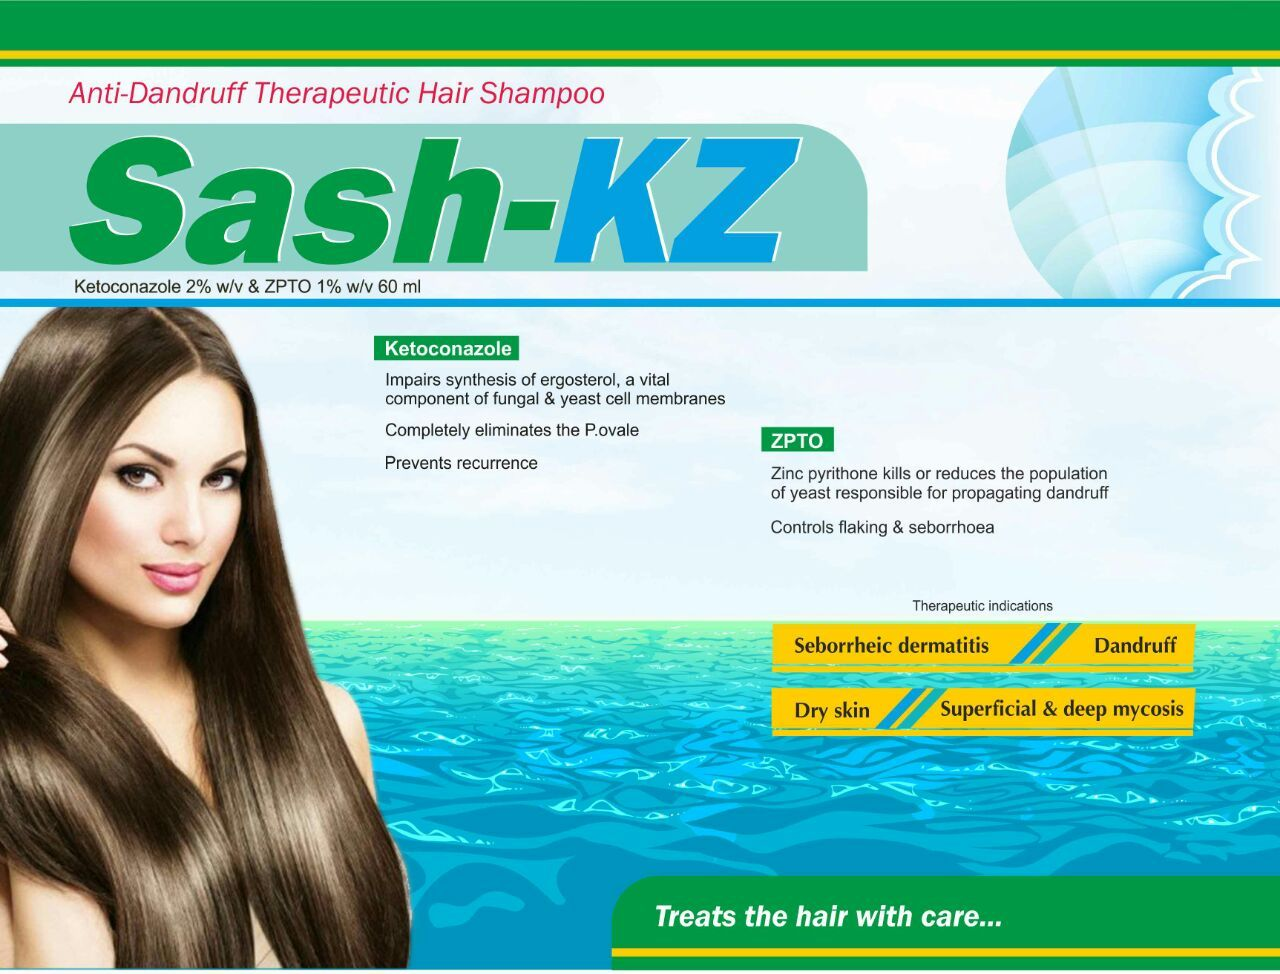 Ketoconazole + ZPTO Shampoo